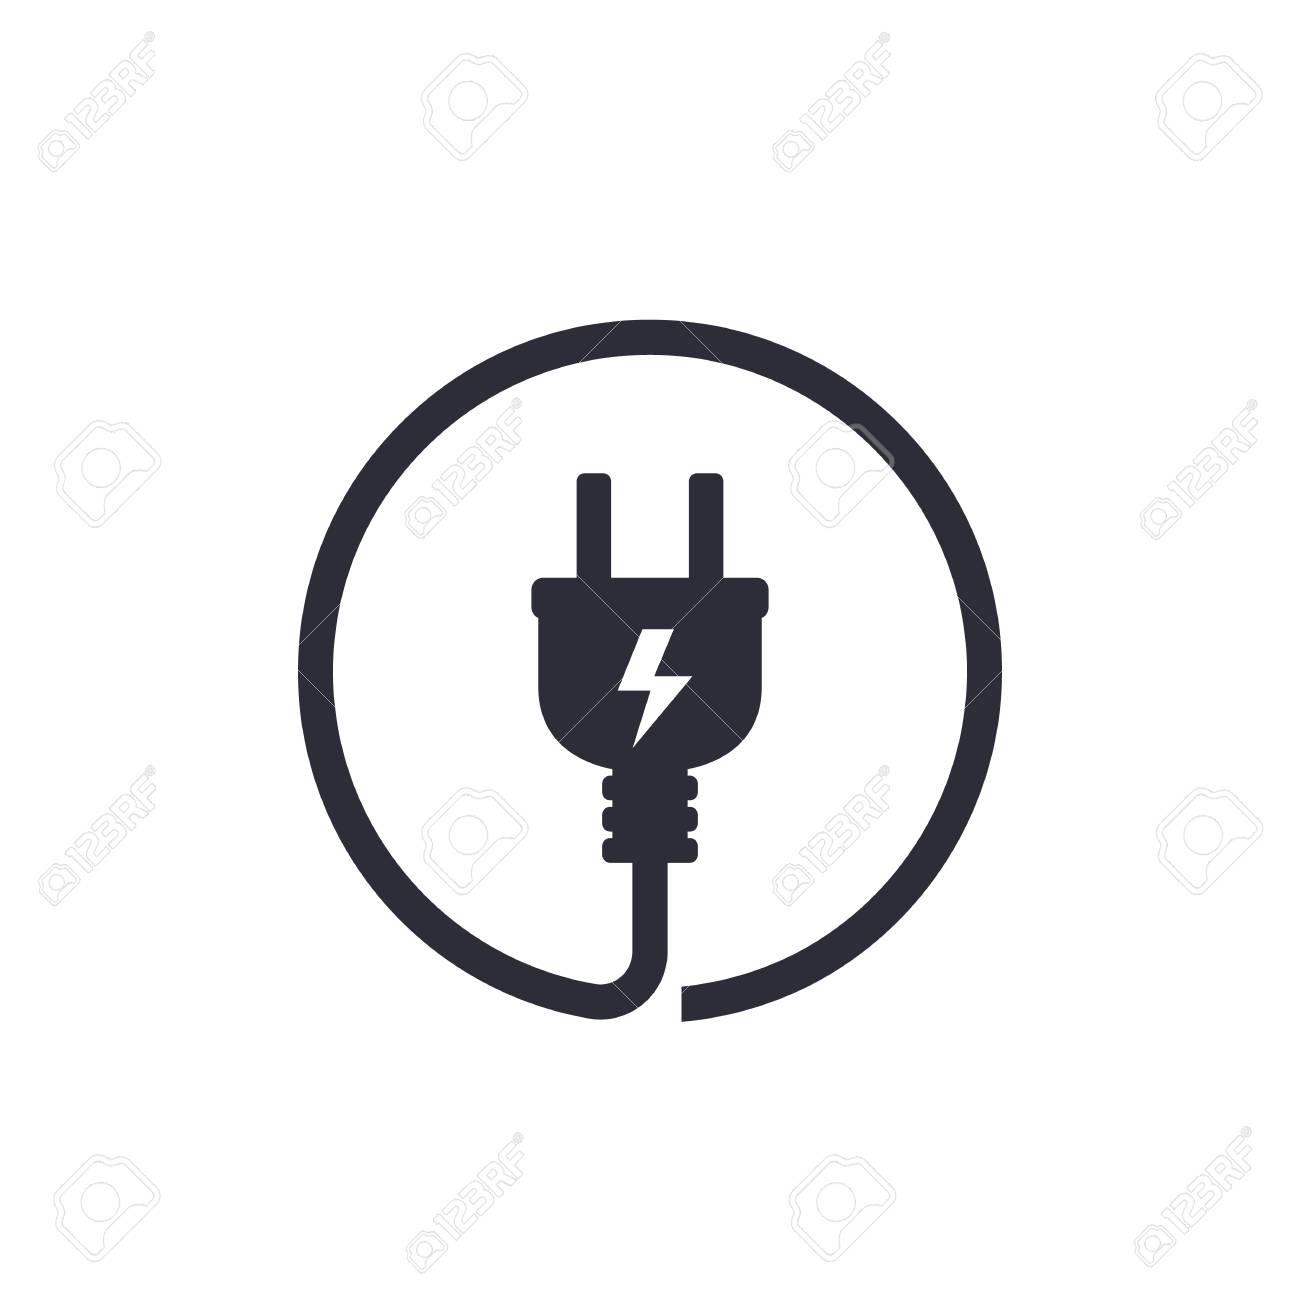 Electric plug icon - 99184973